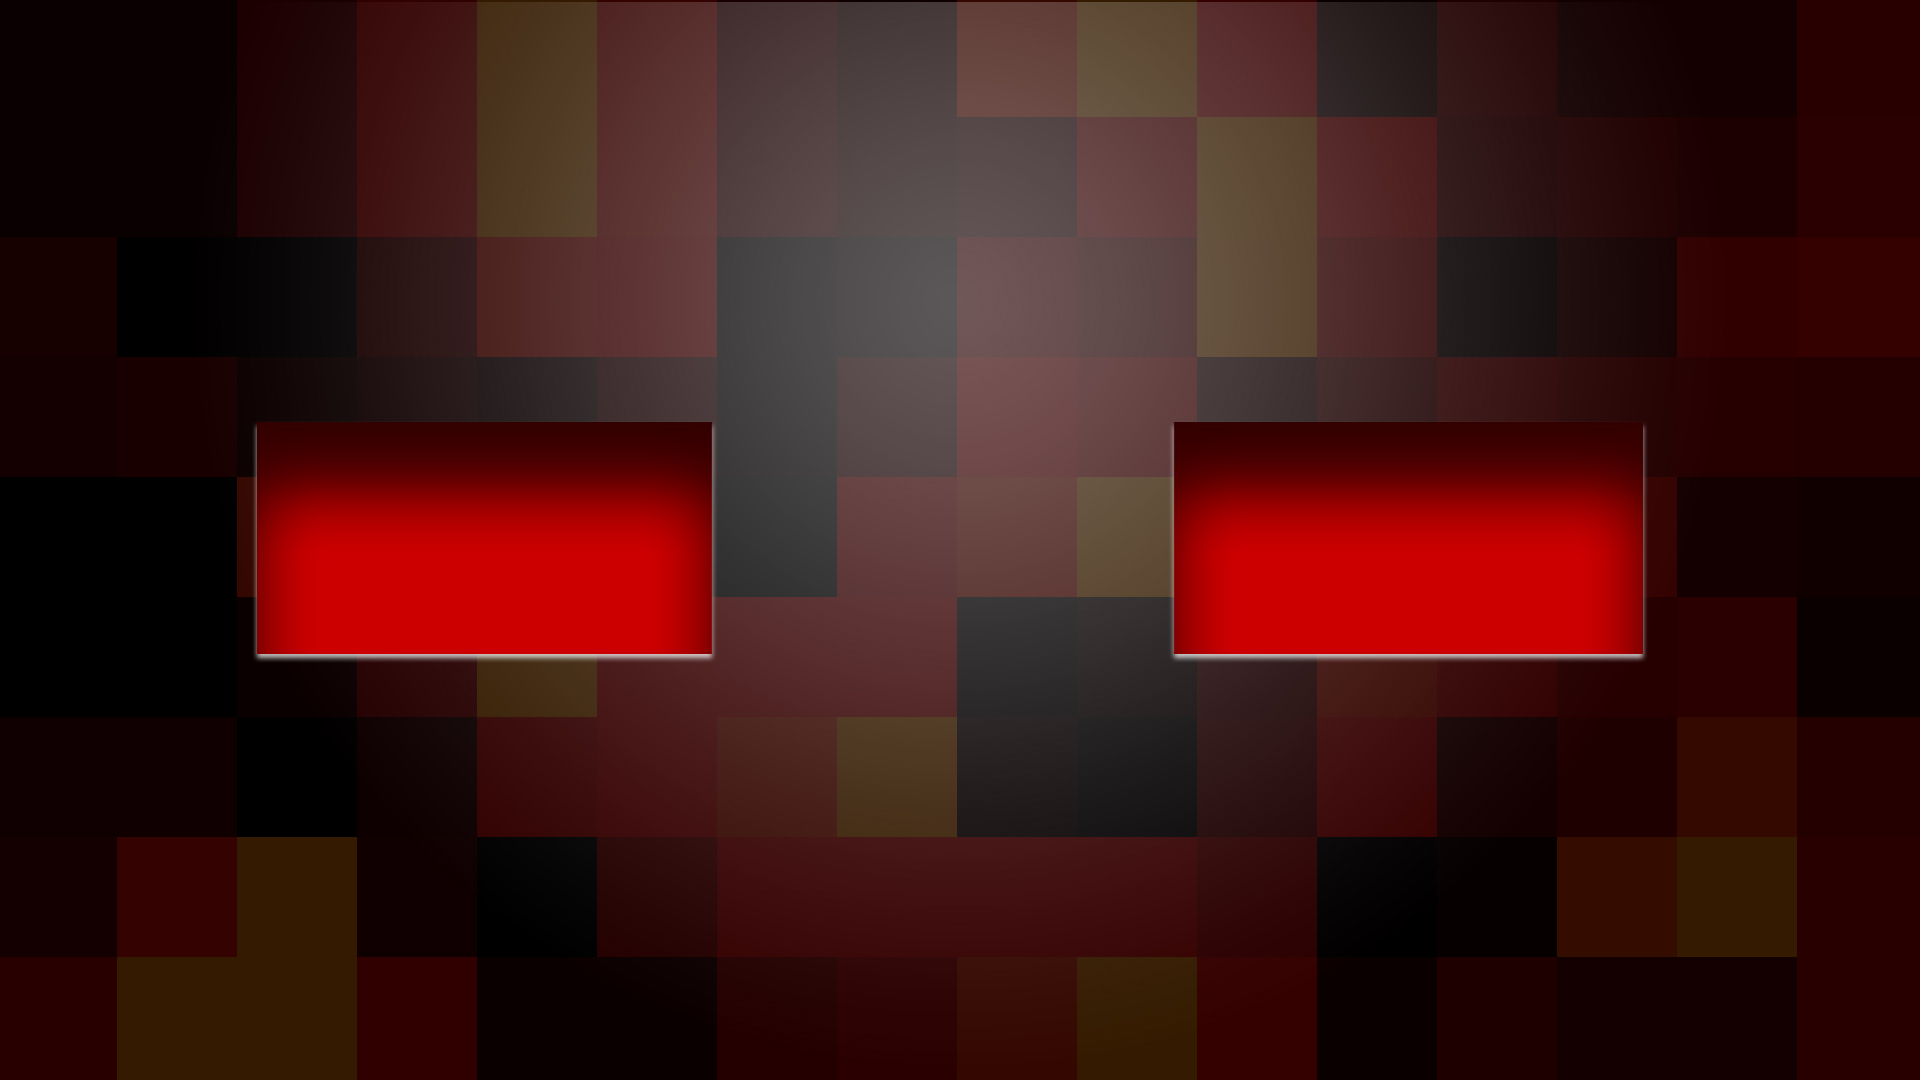 Popular Wallpaper Minecraft Enderman - magma_cube_wallpaper_by_averagejoeftw-d4je8y4  Pic_45963.jpg